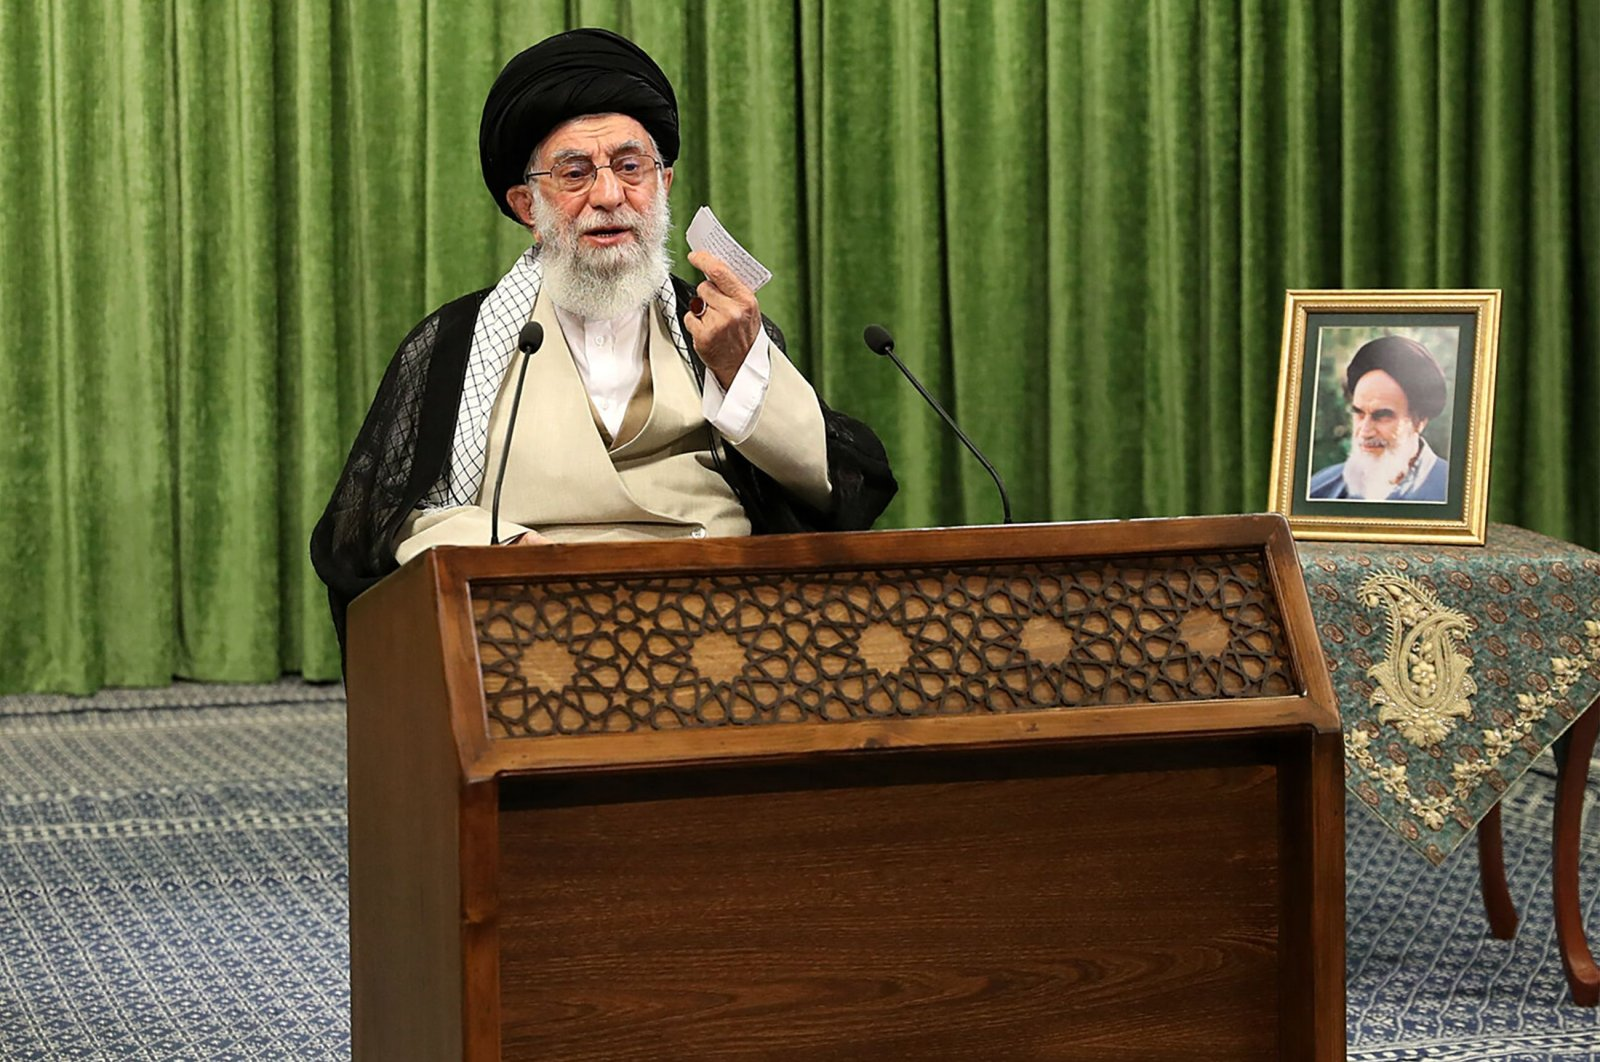 Iranian Supreme Leader Ayatollah Ali Khamenei addressing parliament members during an online meeting, with a picture of his predecessor, the late Ayatollah Ruhollah Khomeini next to him, Tehran, Iran, May 27, 2021. (Khamenei.ir handout via AFP)